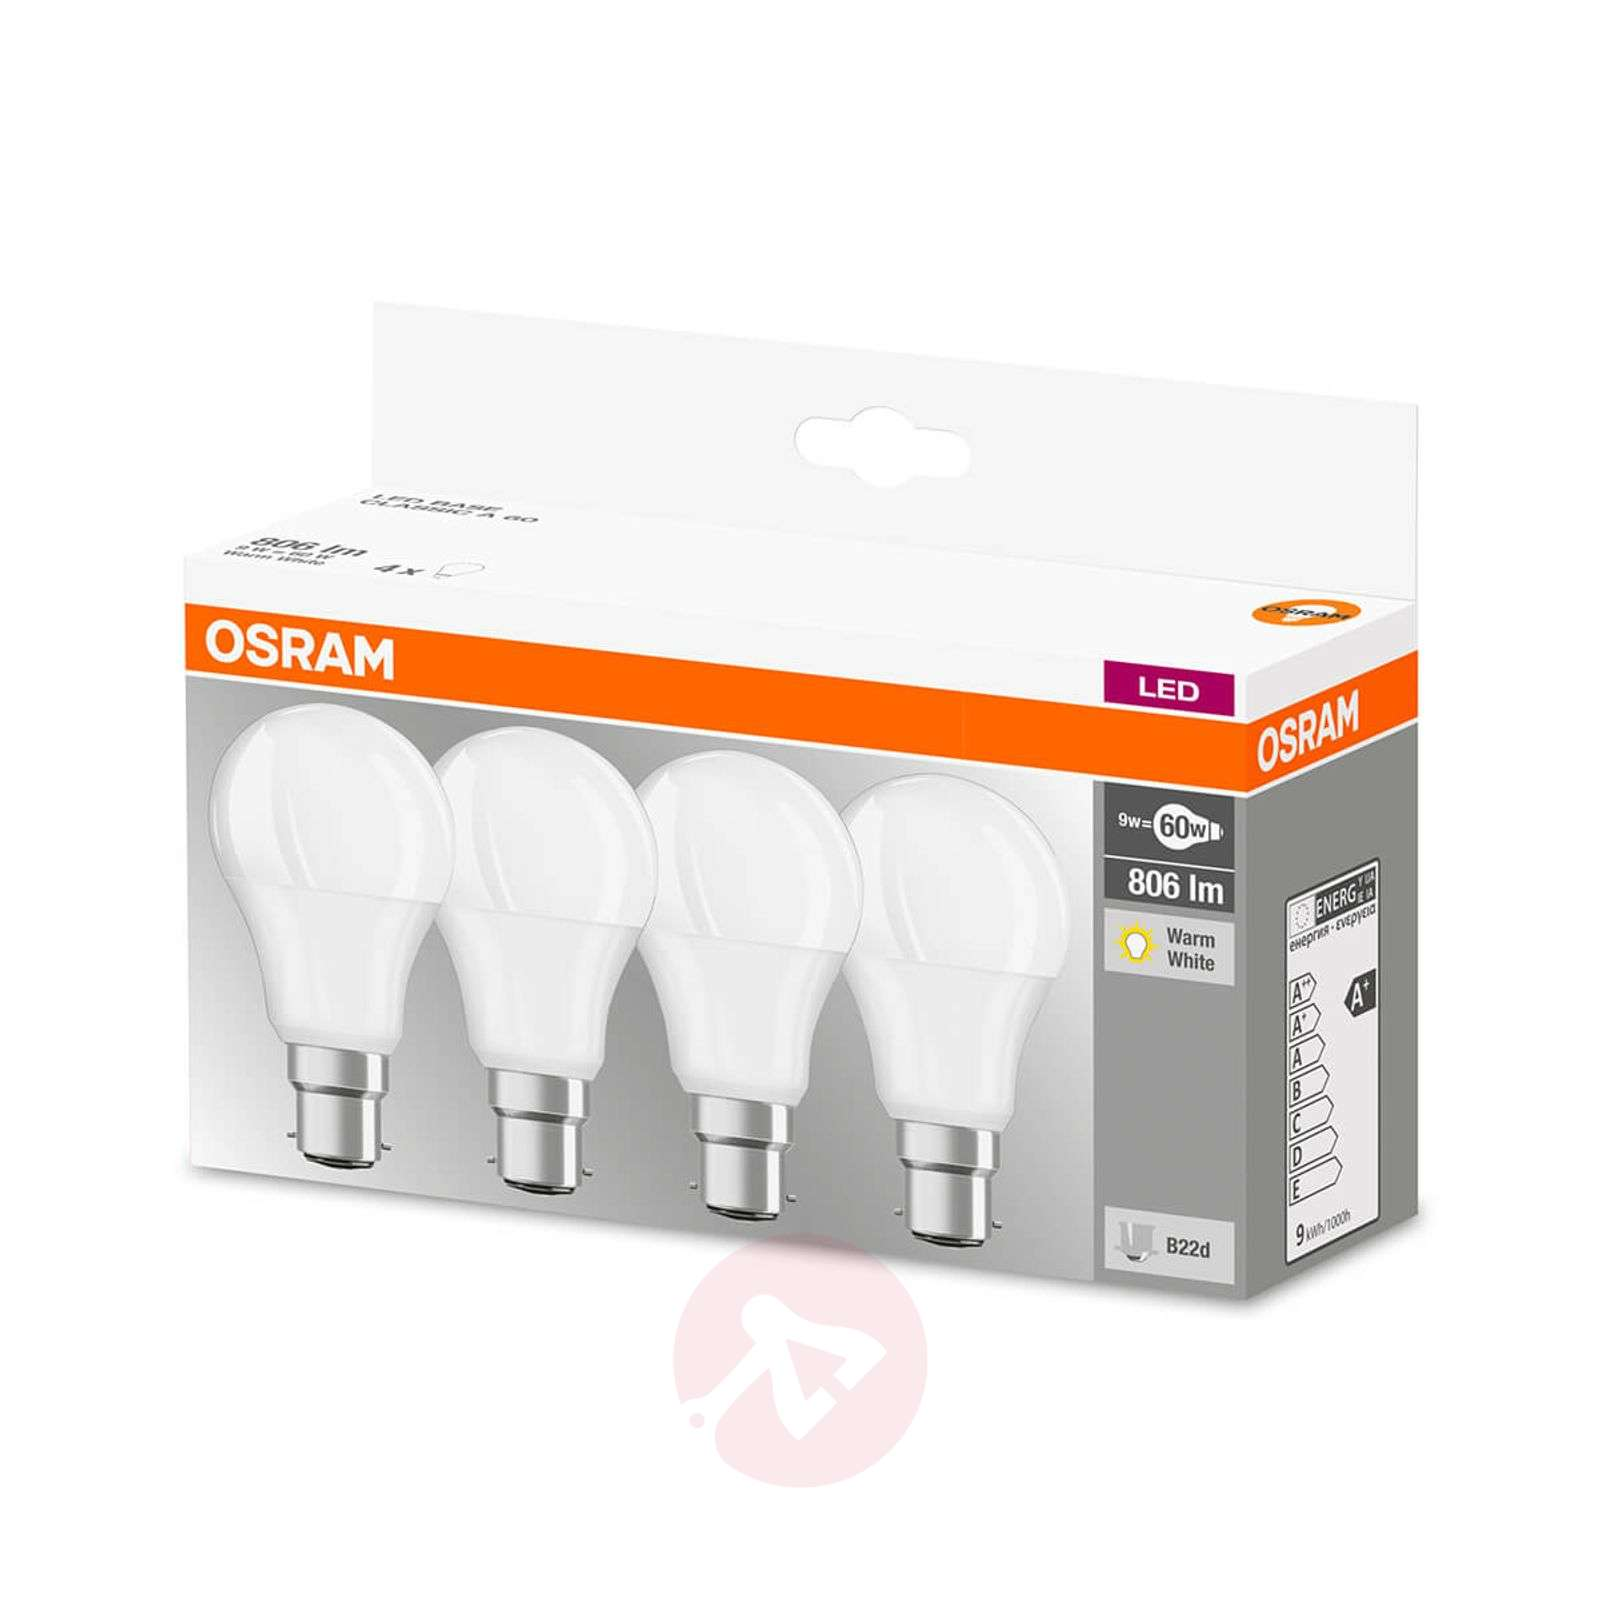 Led Bulb B22d 9w Warm White 806 Lumens Set Of 4 Lights Ie